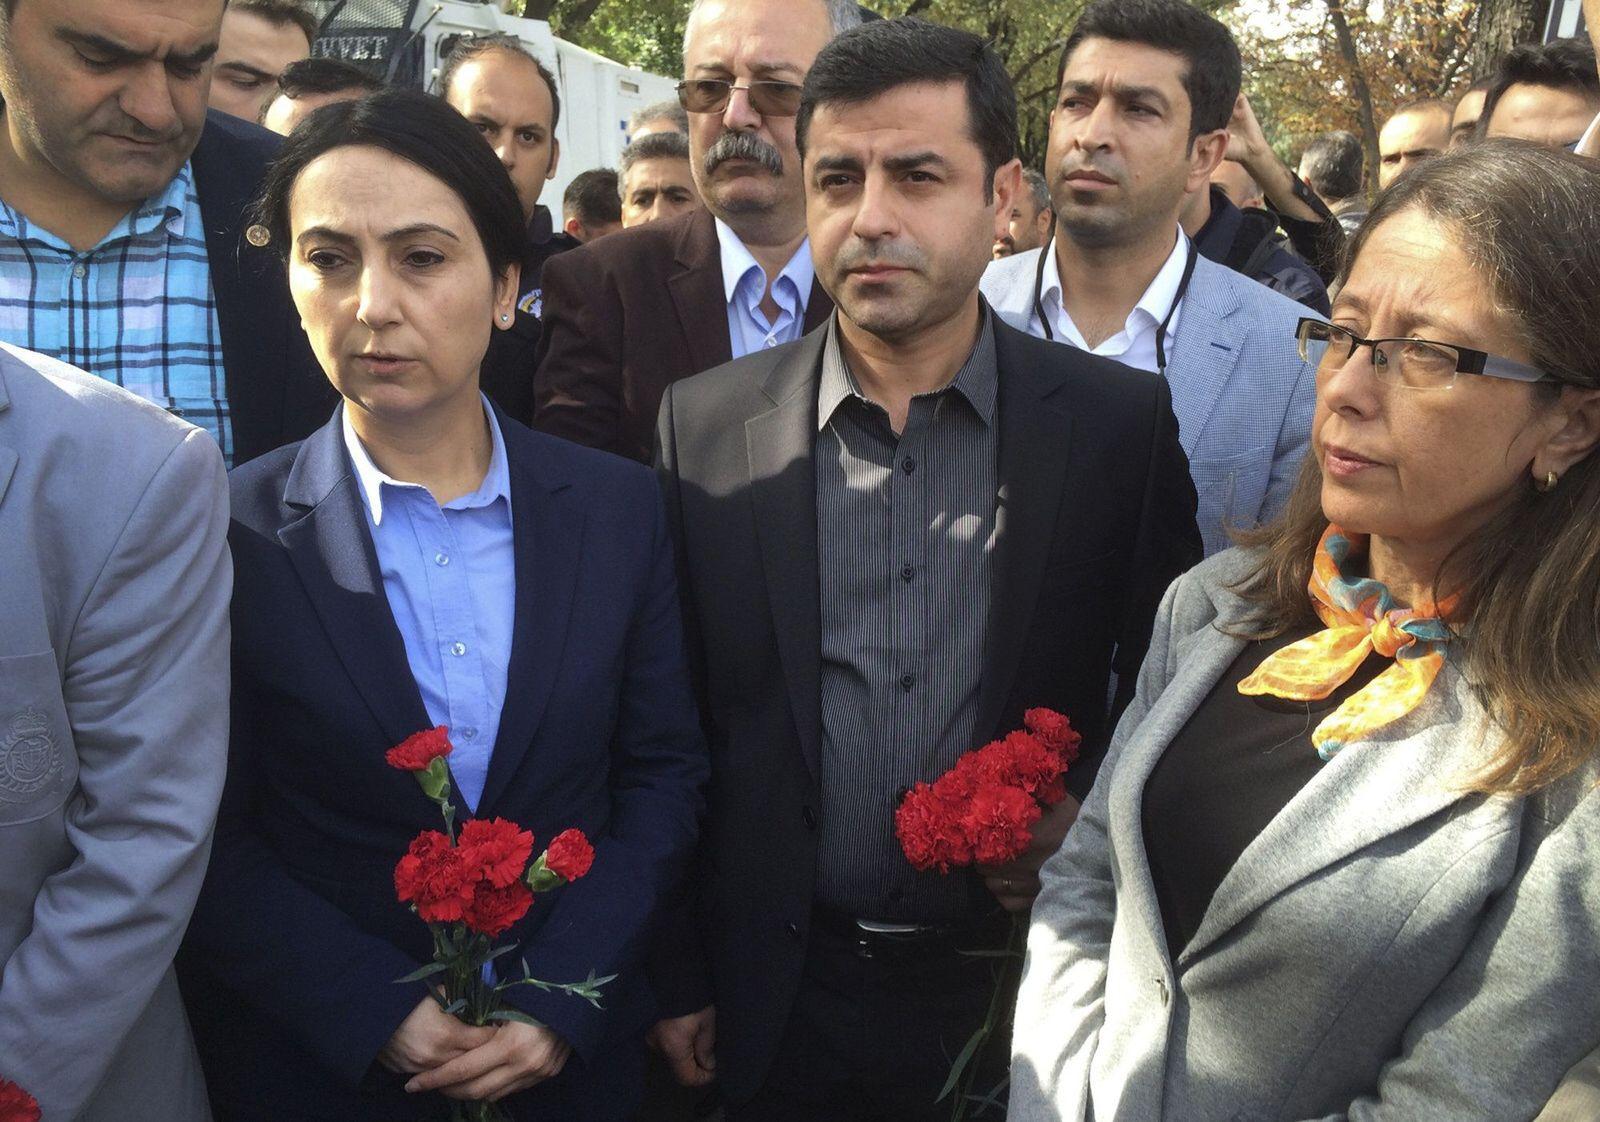 Ankara/ Selahattin Demirtas/ Figen Yuksekdag